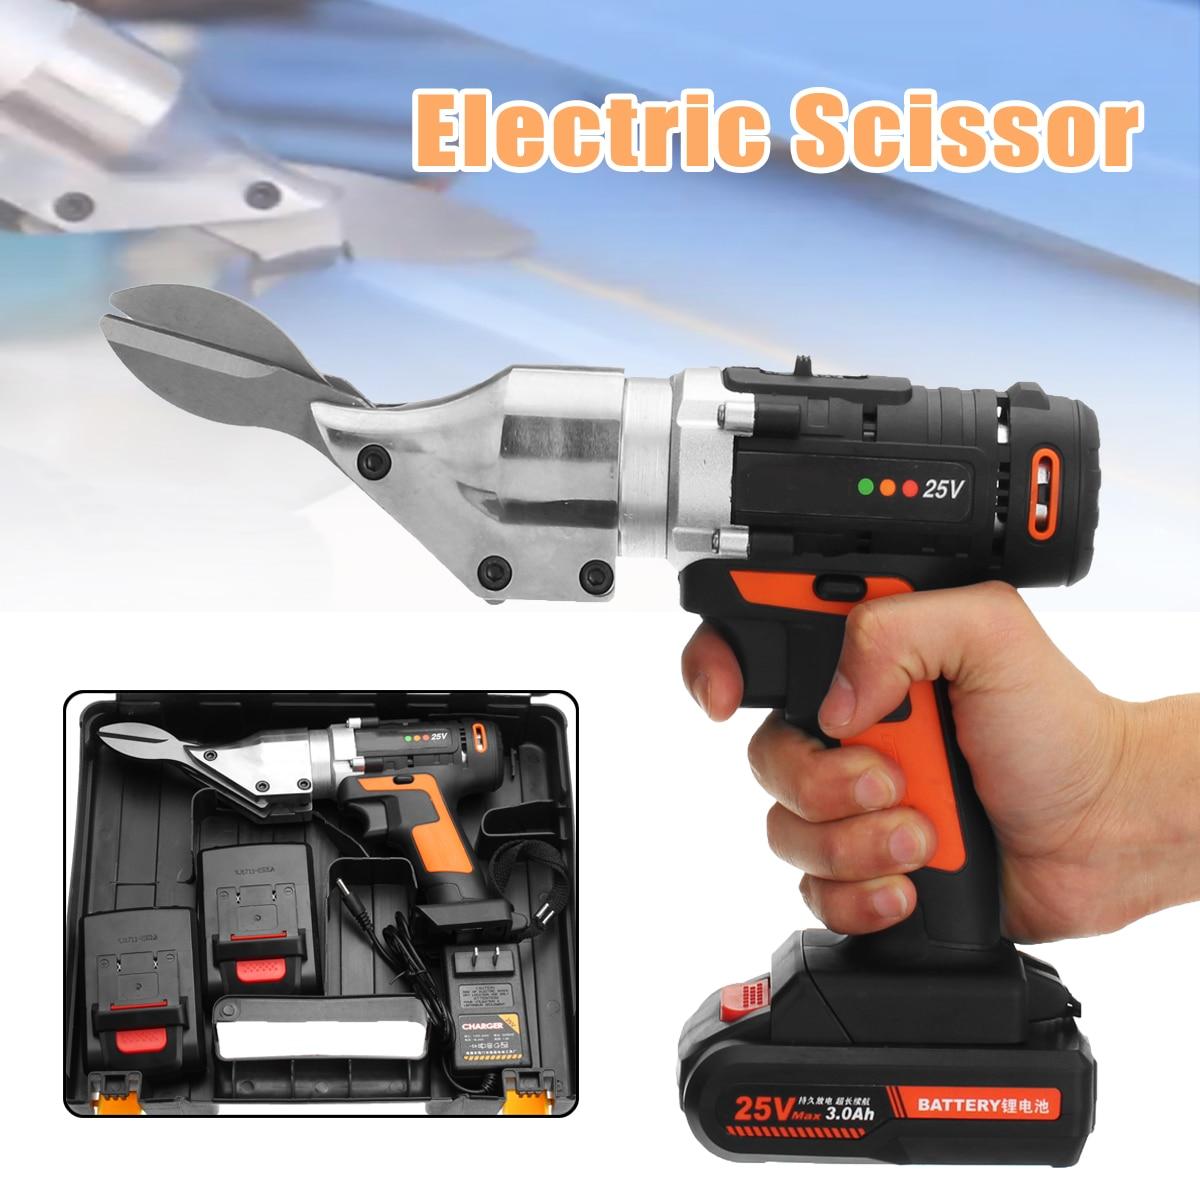 25V Li ion Cordless Electric Scissor Metal Sheet Shear Cutter Scissors Rechargeable 2 Battery Rotating Head Power Tool